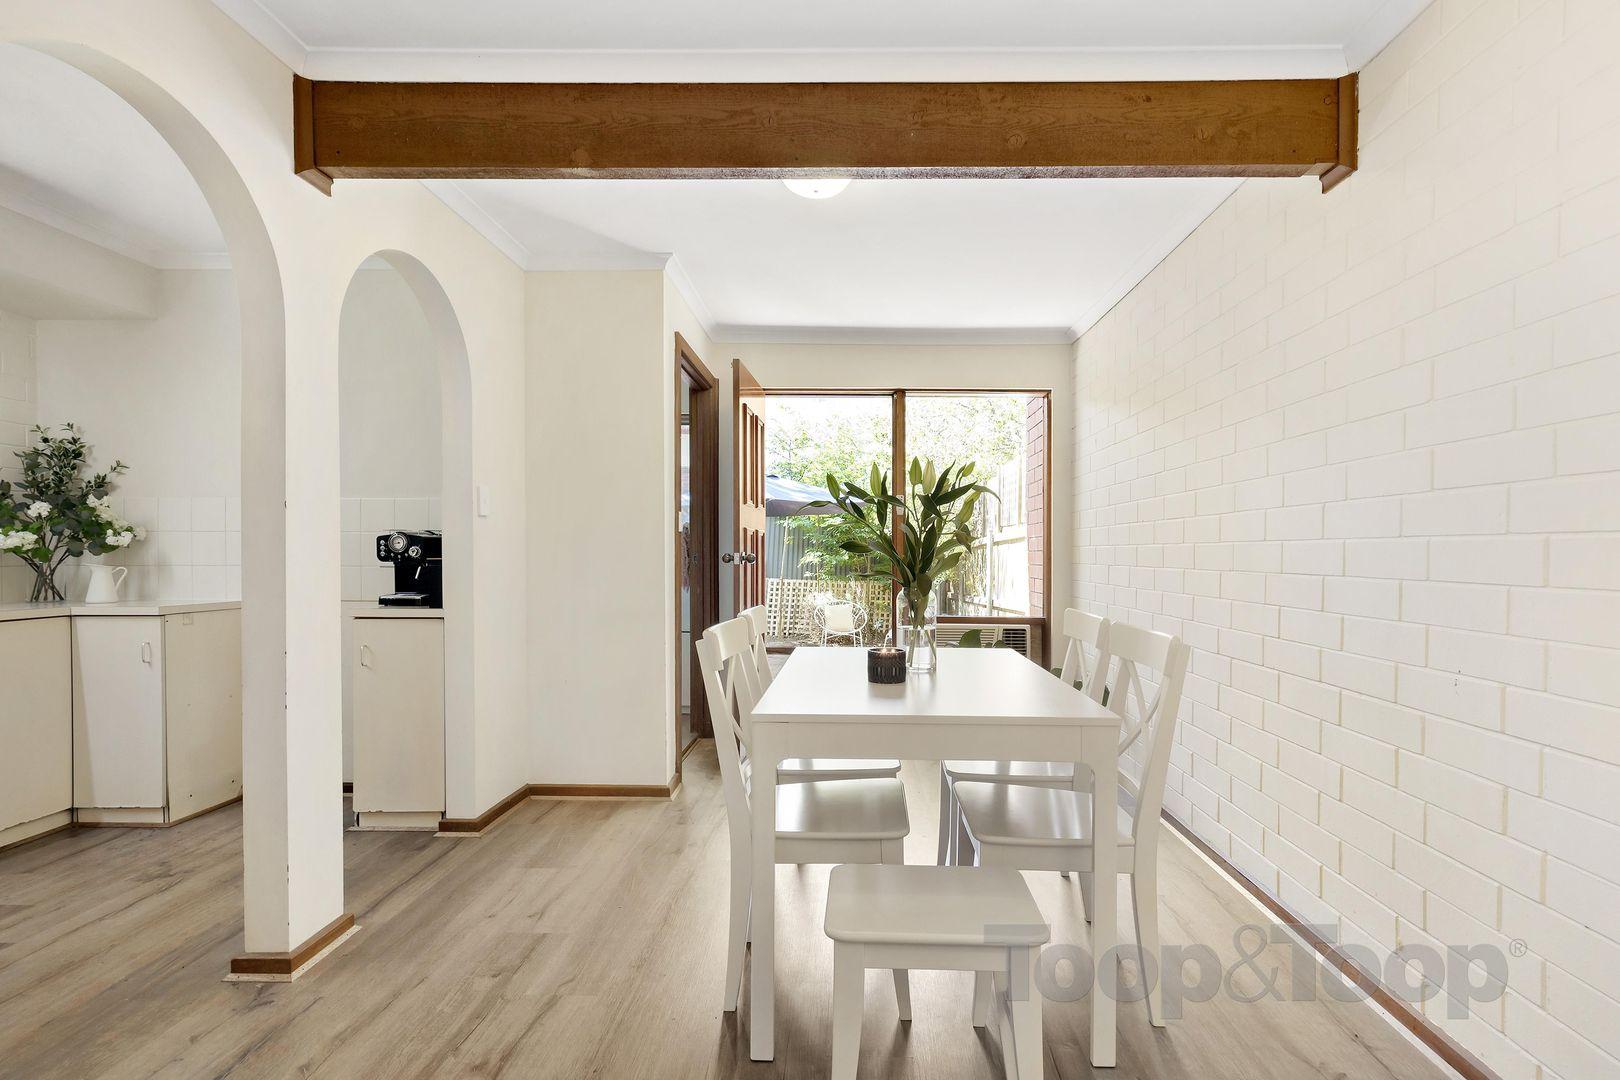 18/88 Barton Terrace West, North Adelaide SA 5006, Image 2